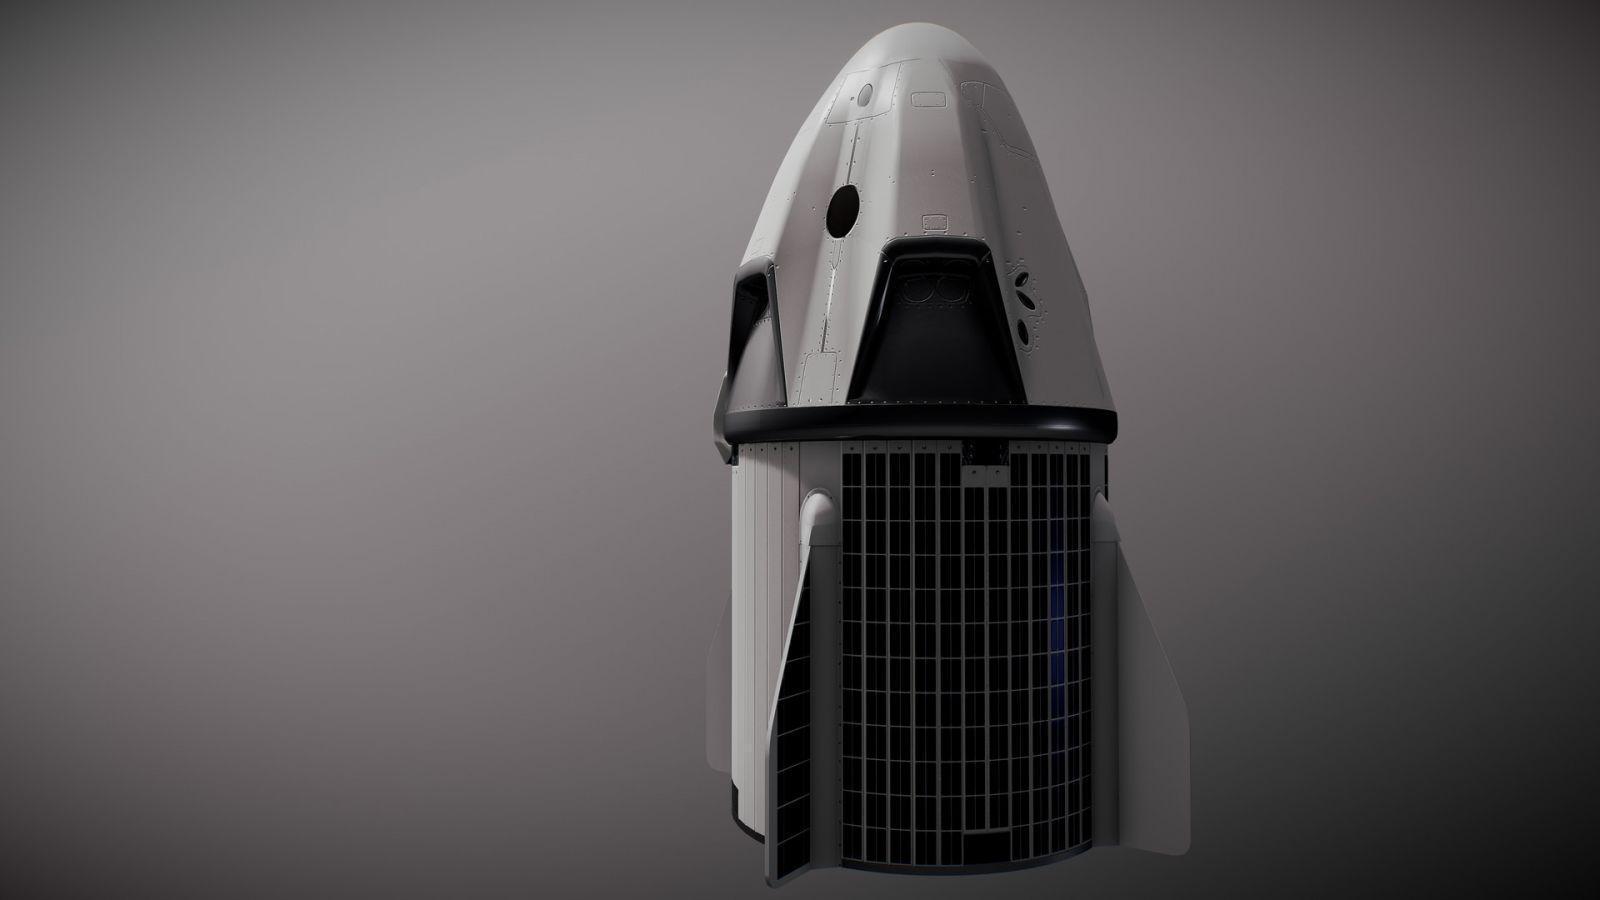 Сегодня SpaceX запустит Crew Dragon: начало трансляции в 23:33 по МСК (jack parsons dragon by hiyu sketchfab 2)